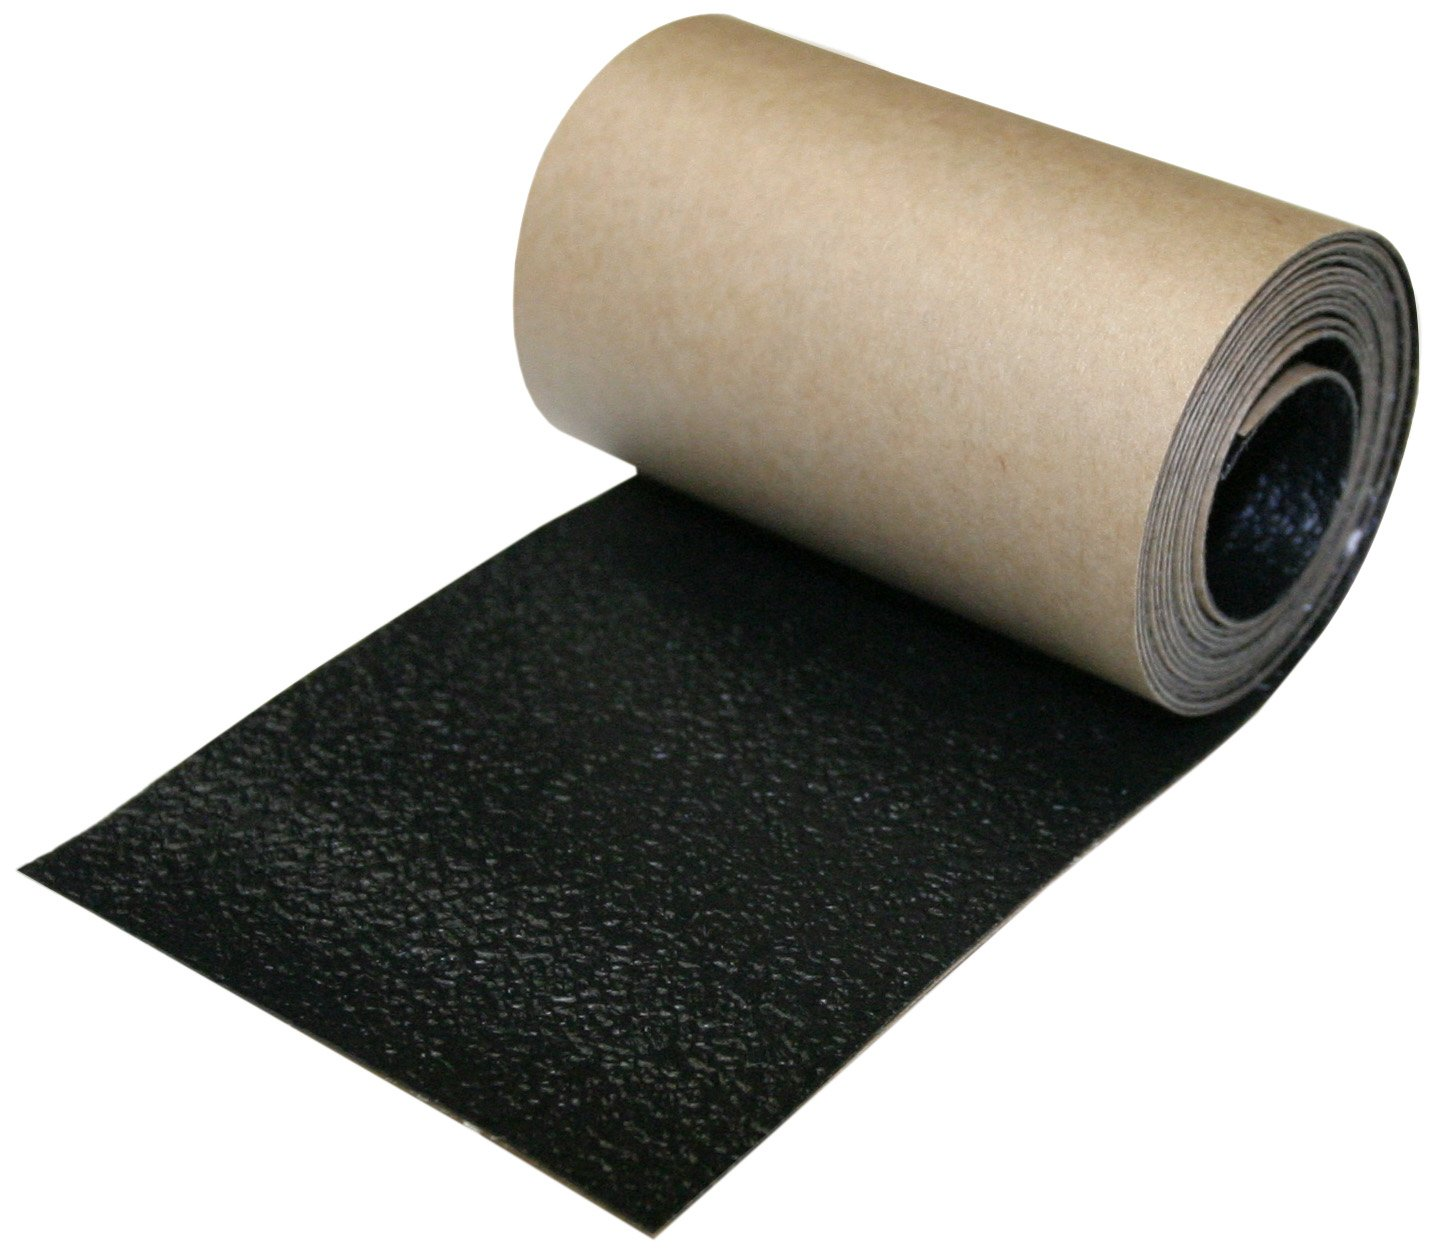 "XPEL Black Universal Door Sill Guard (60"" x 2.75"") Paint Protection Film Kit"